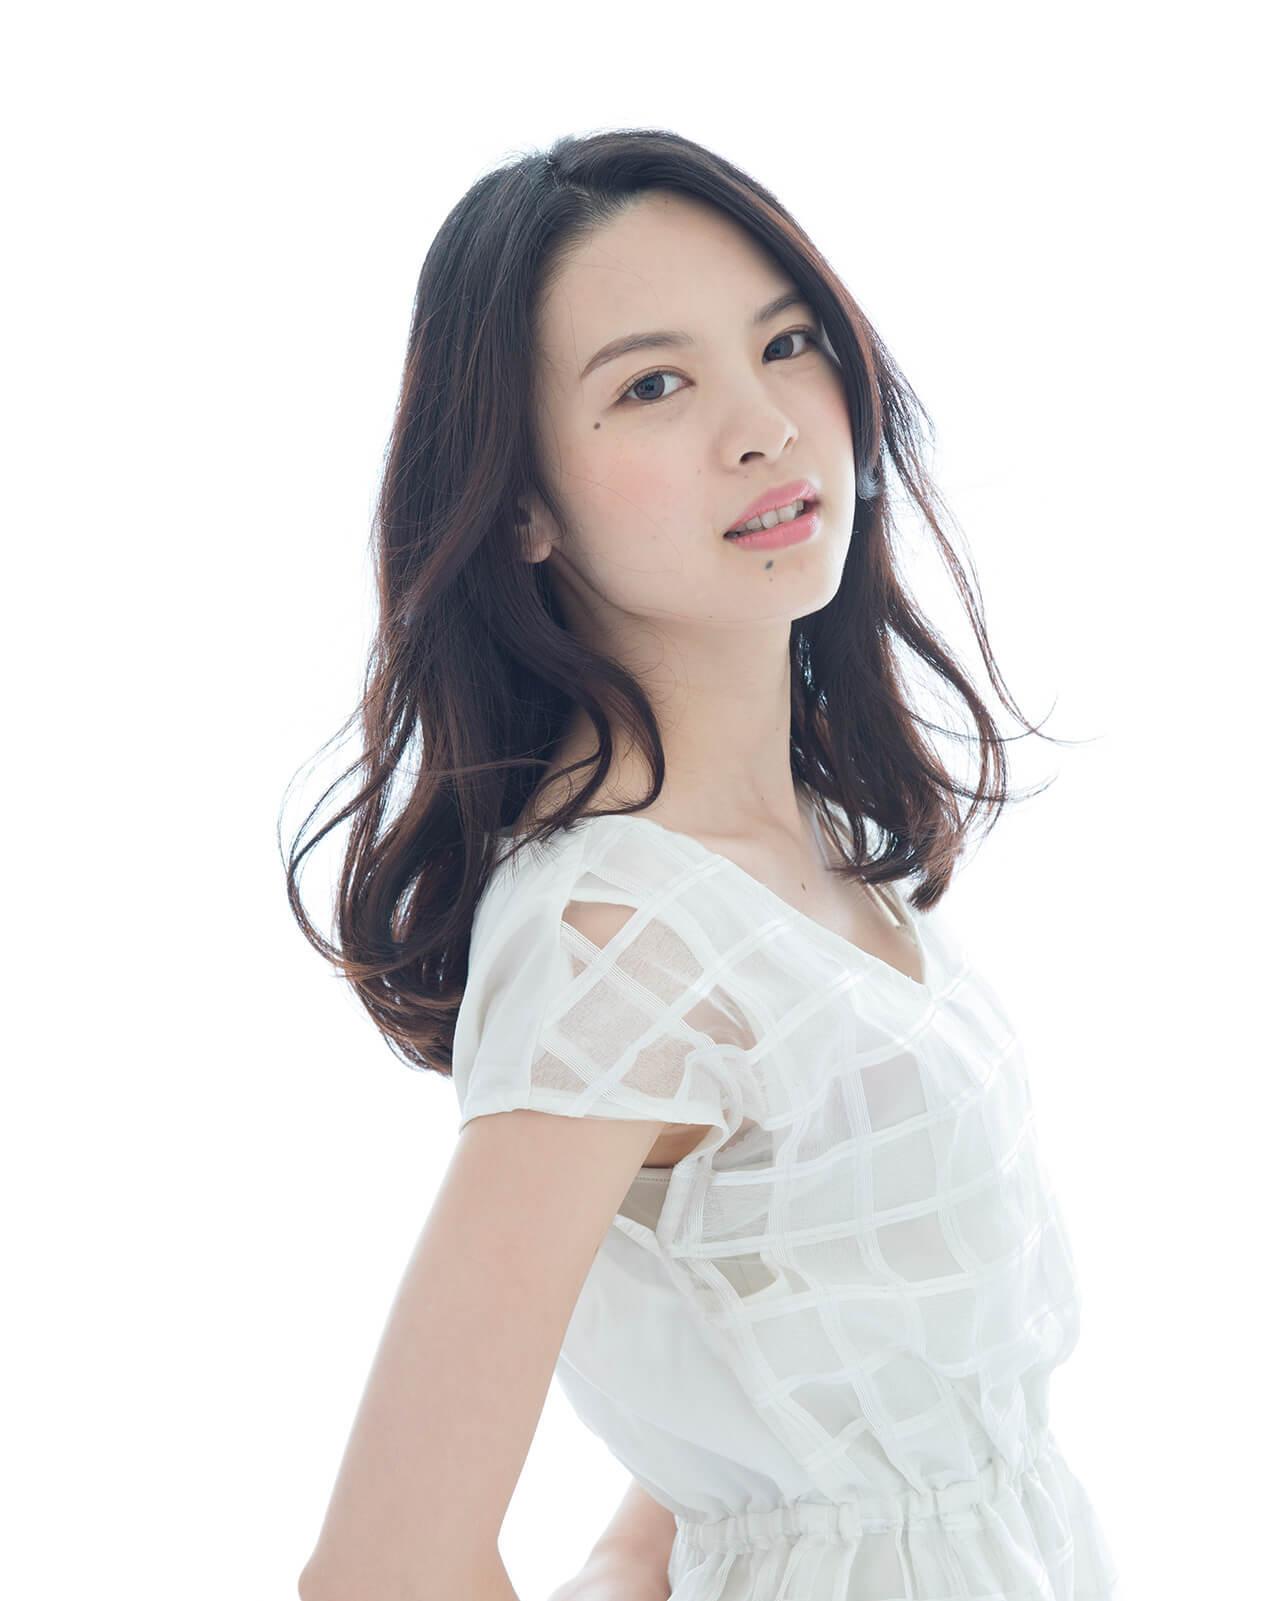 Inoue01